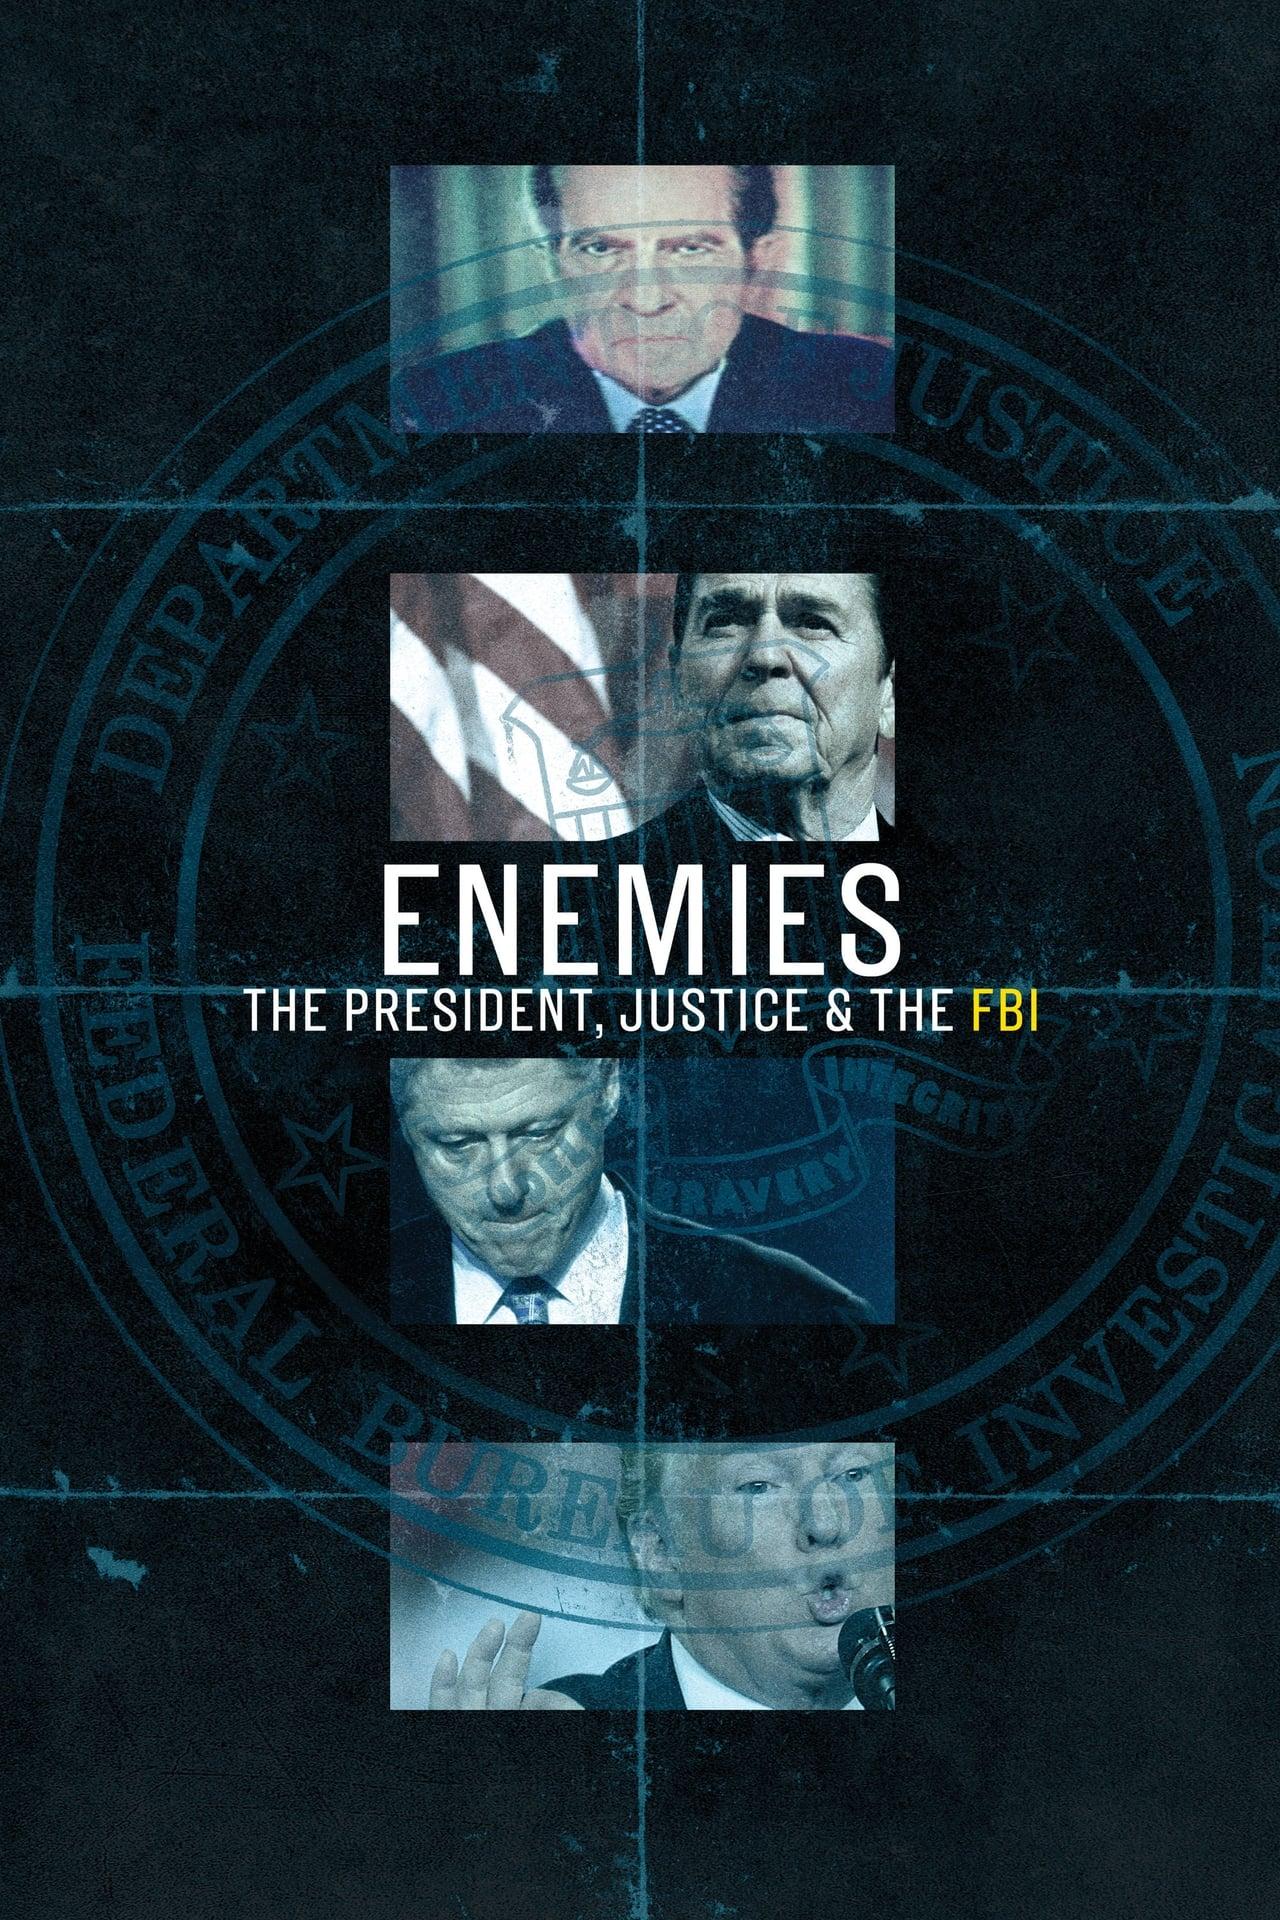 Enemies: The President, Justice & The Fbi Season 1